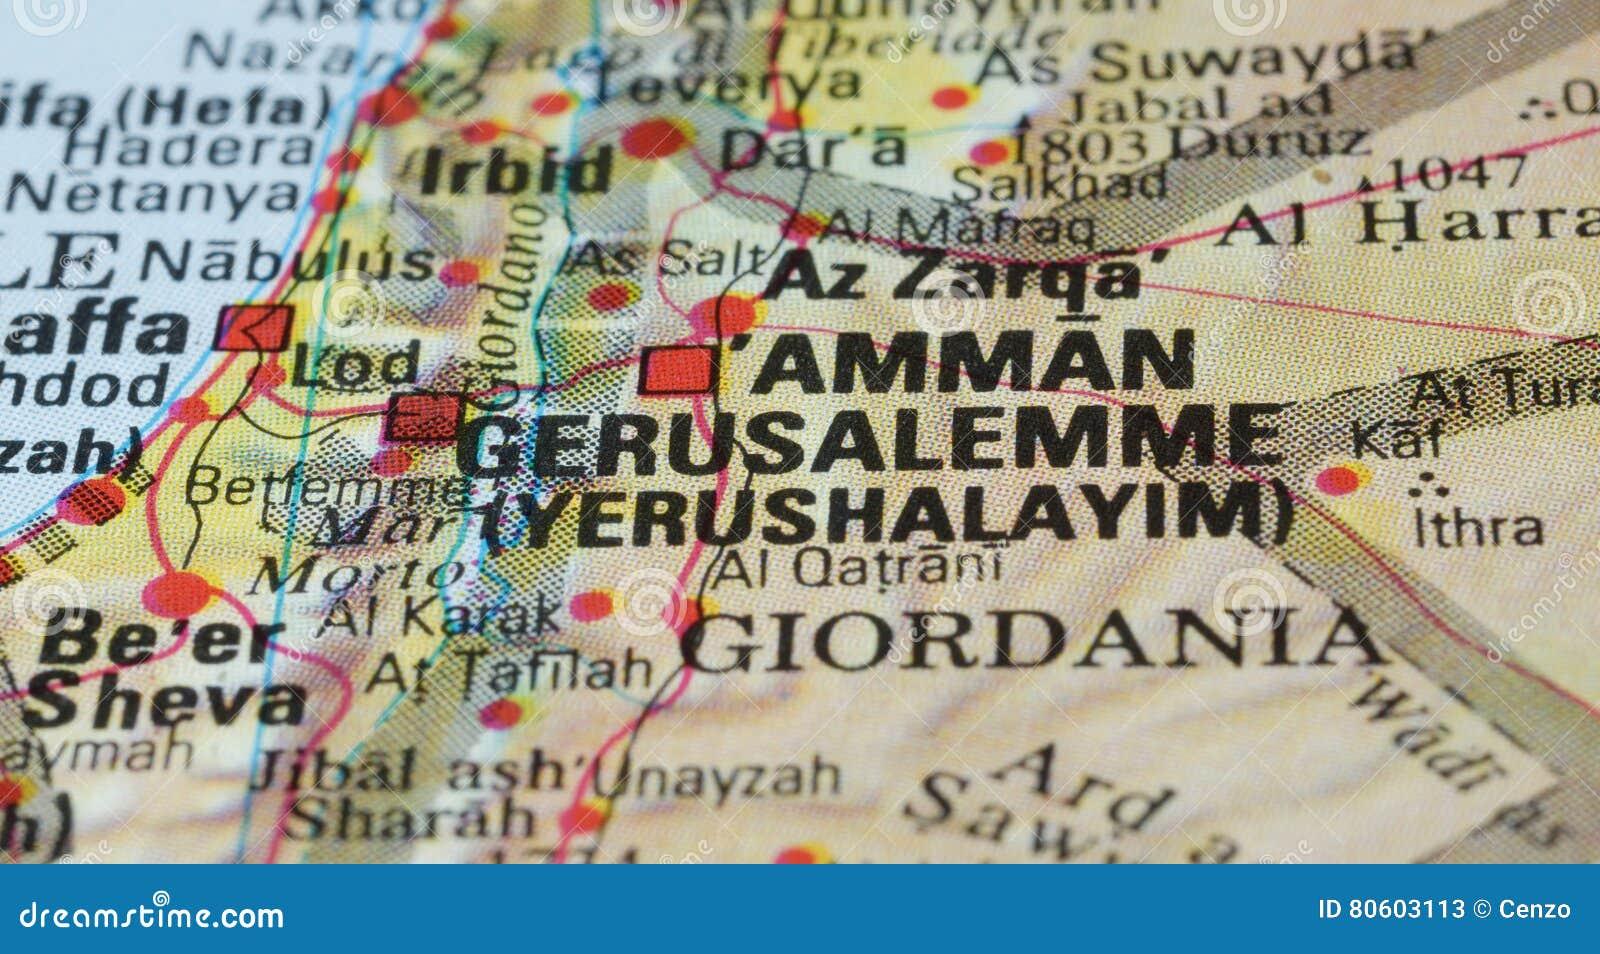 Jerusalem road map stock image image of jordan tourism 80603113 download jerusalem road map stock image image of jordan tourism 80603113 publicscrutiny Choice Image